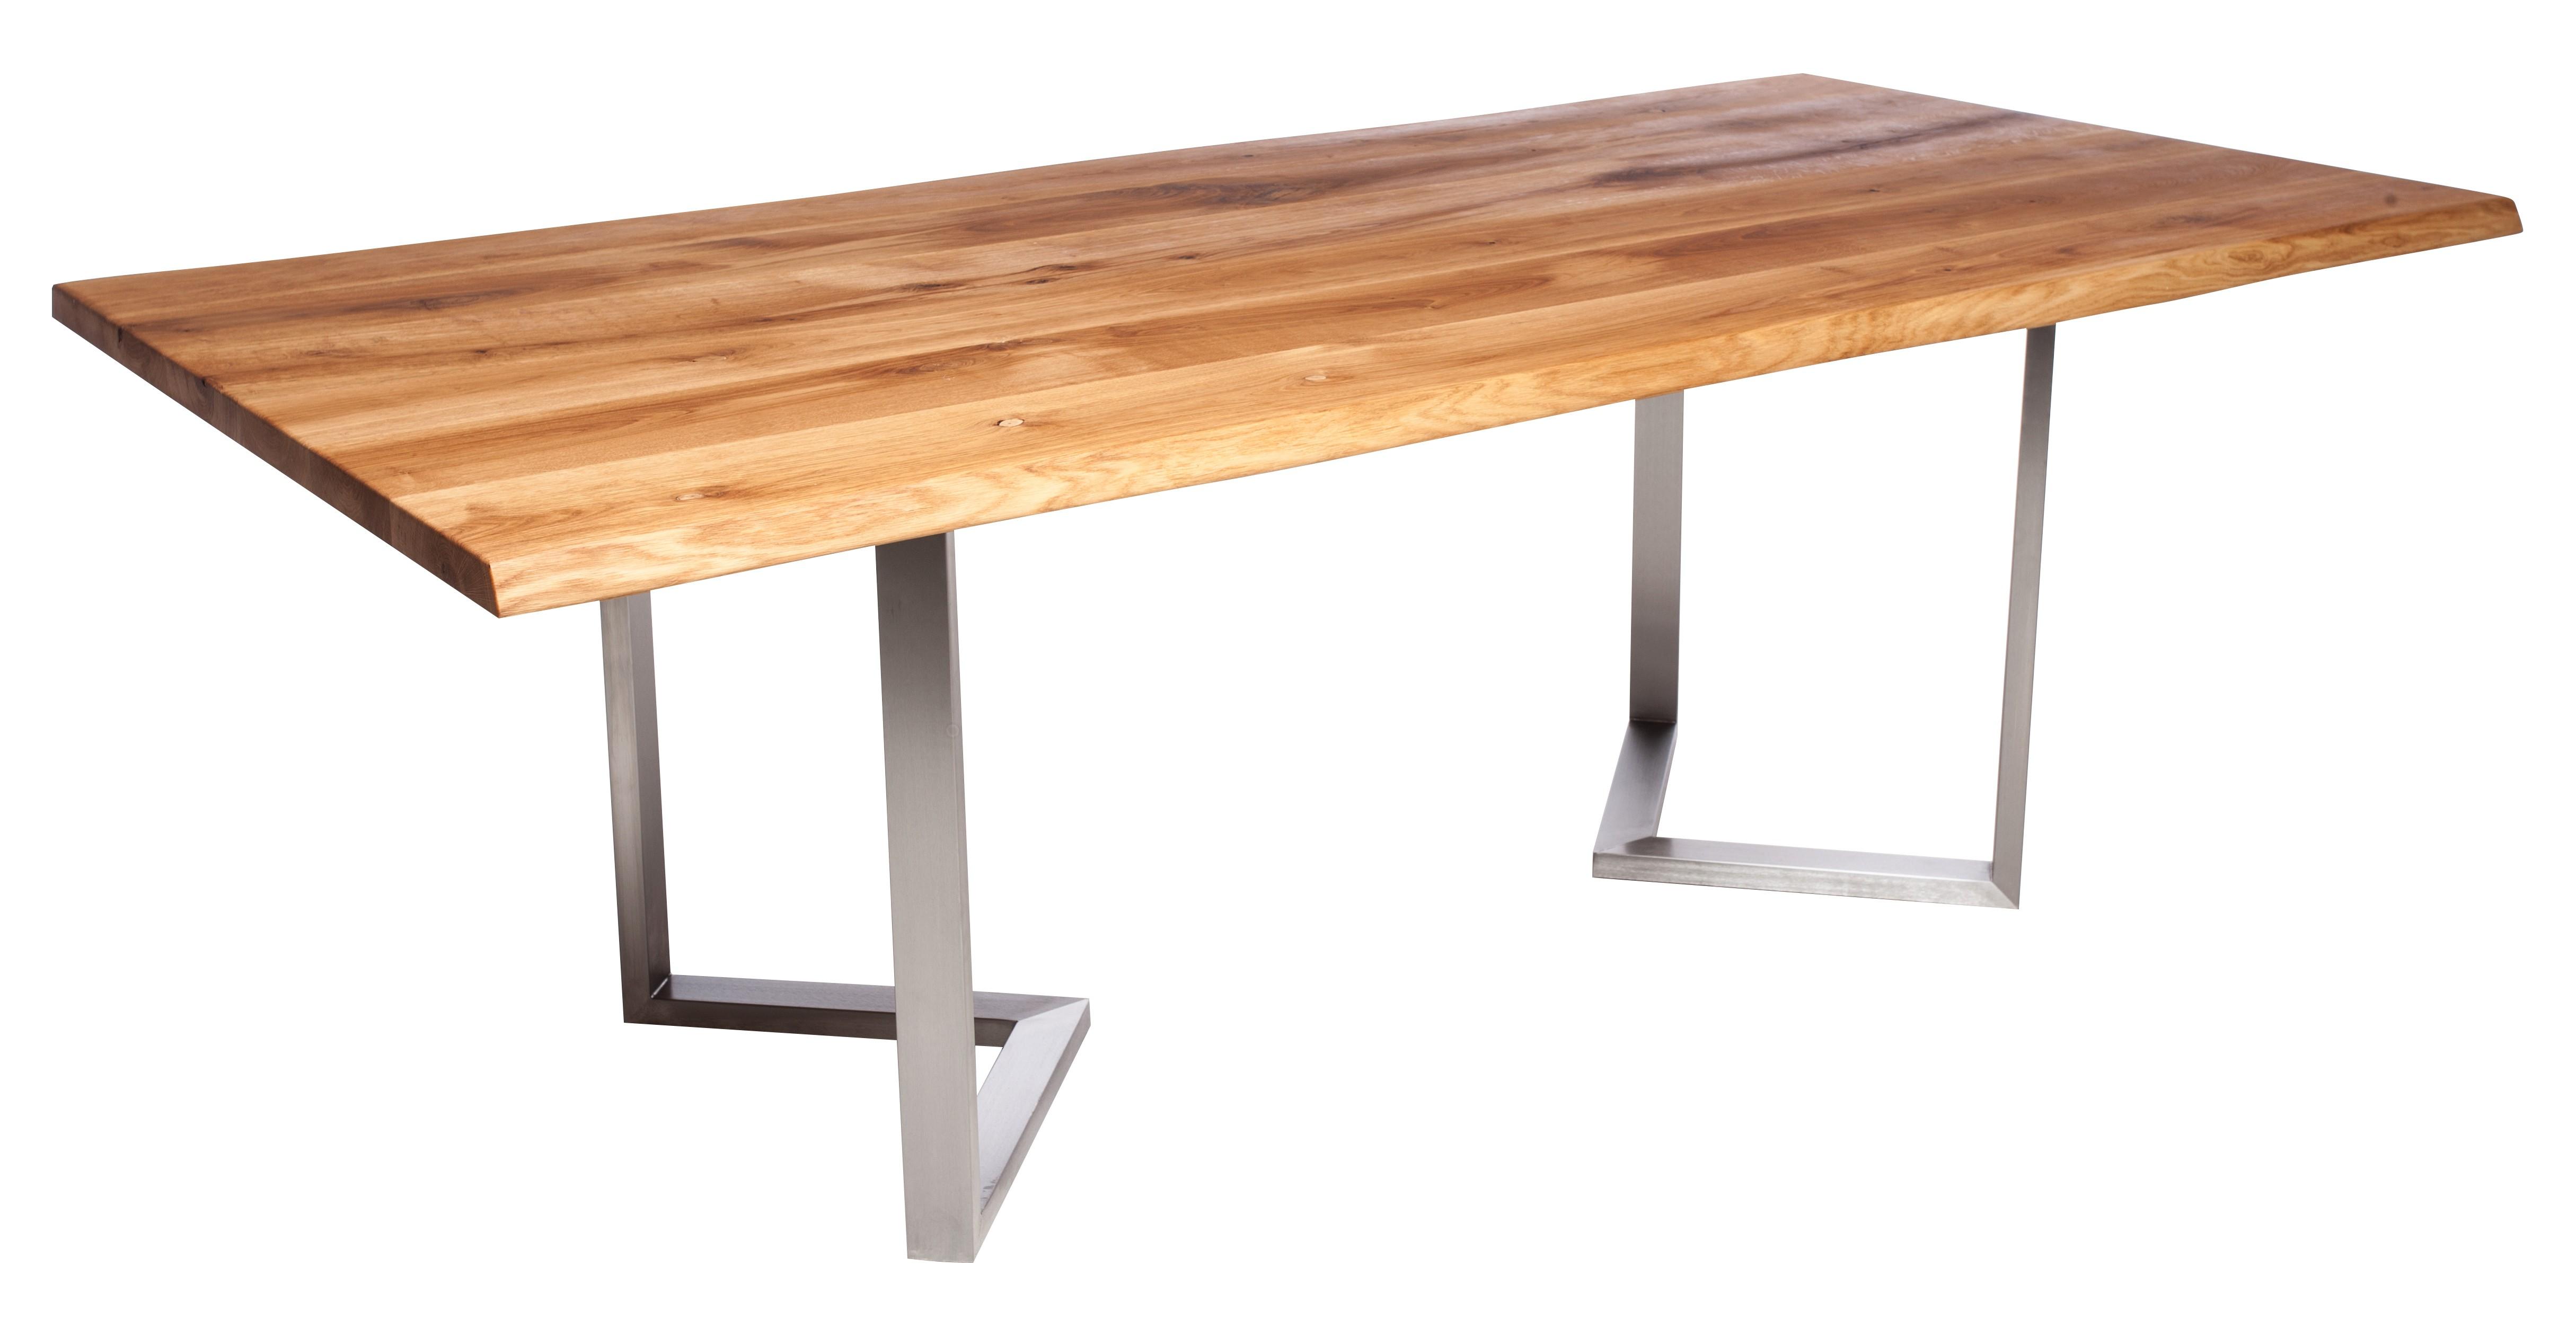 Fargo Oak Dining Table with M-shape leg 3x6cm - Dining Tables ...